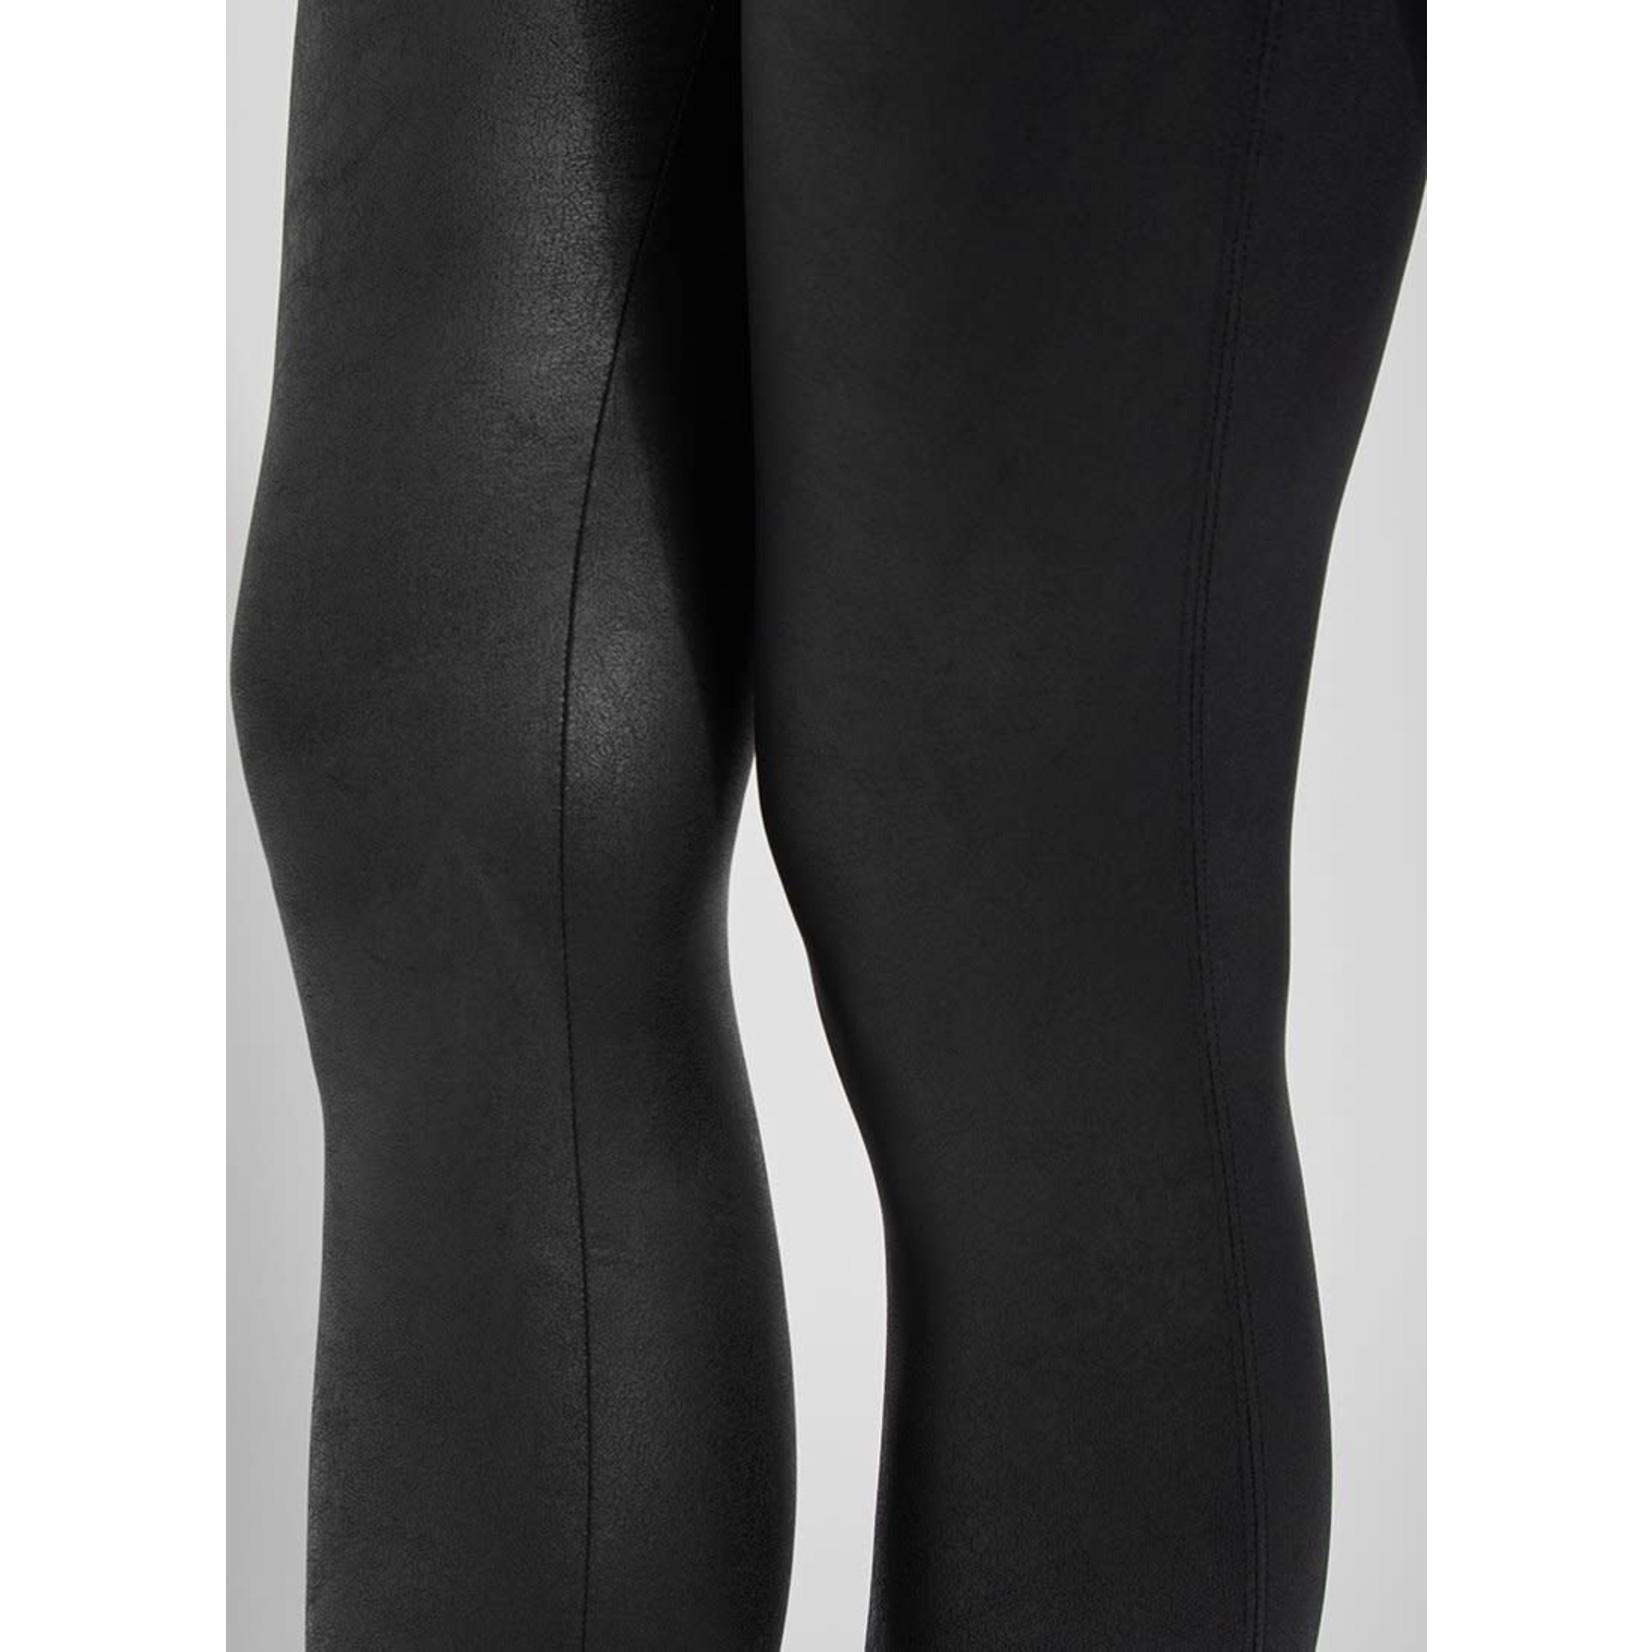 Black Foiled Vegan Leather Legging